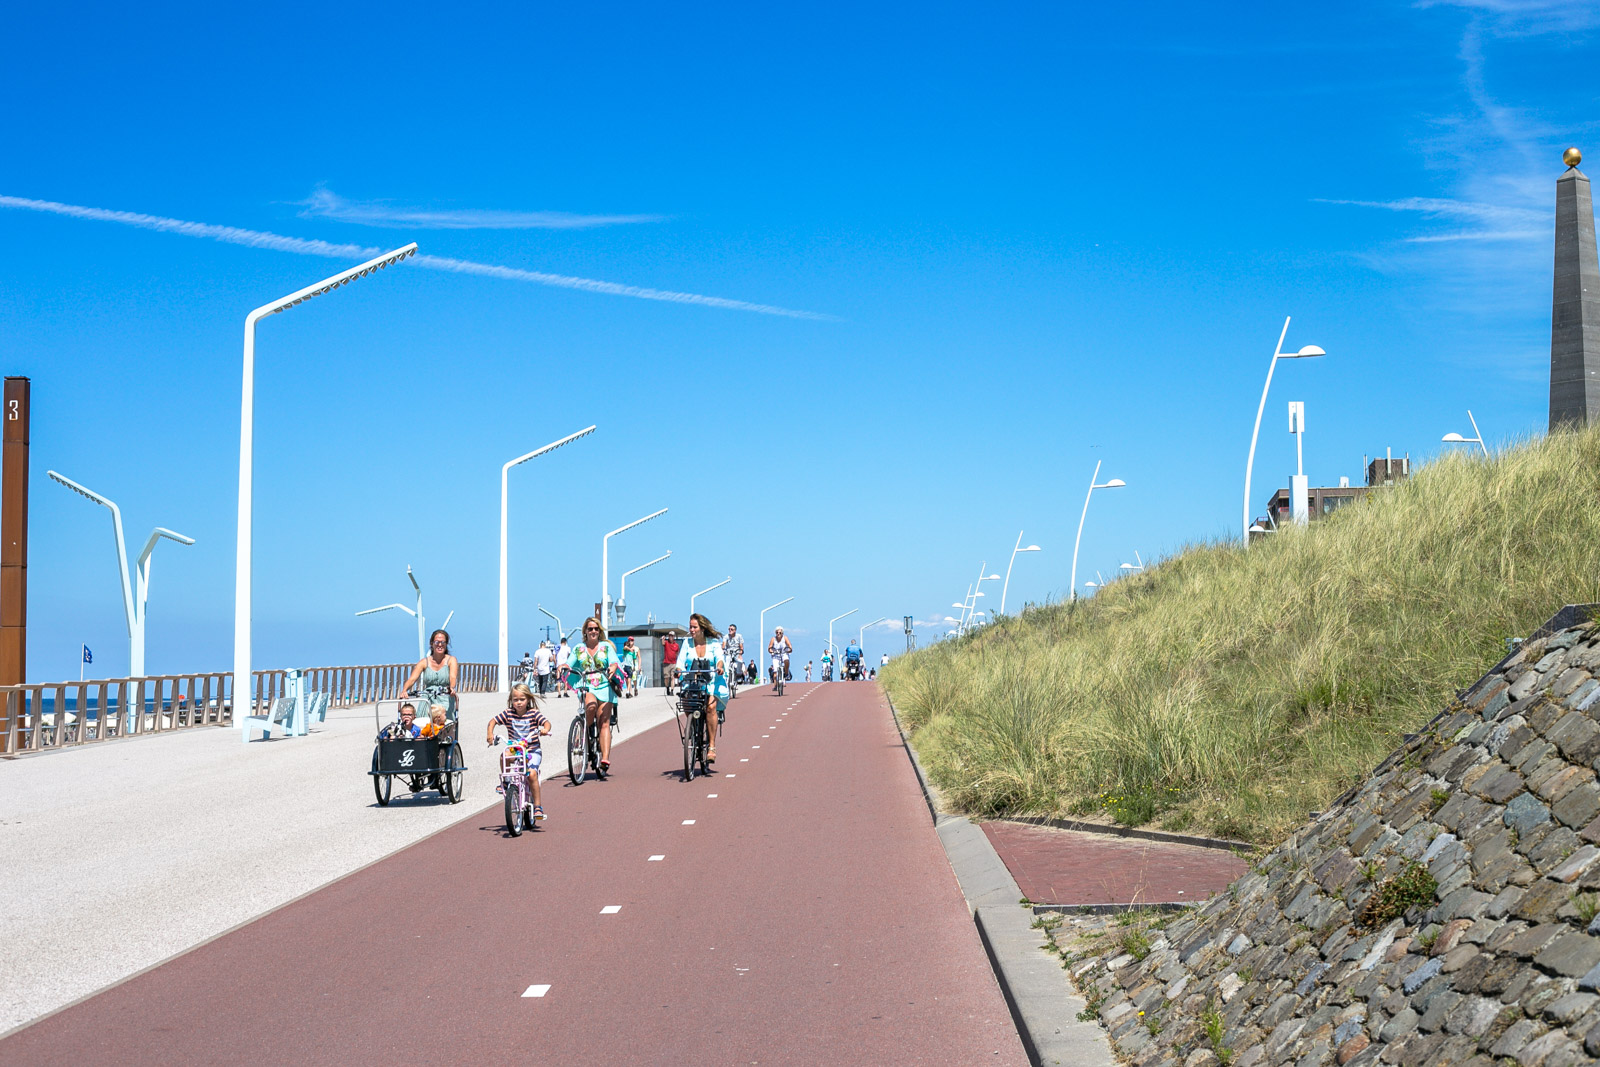 Scheveningen Tipps, Fahrrad fahren